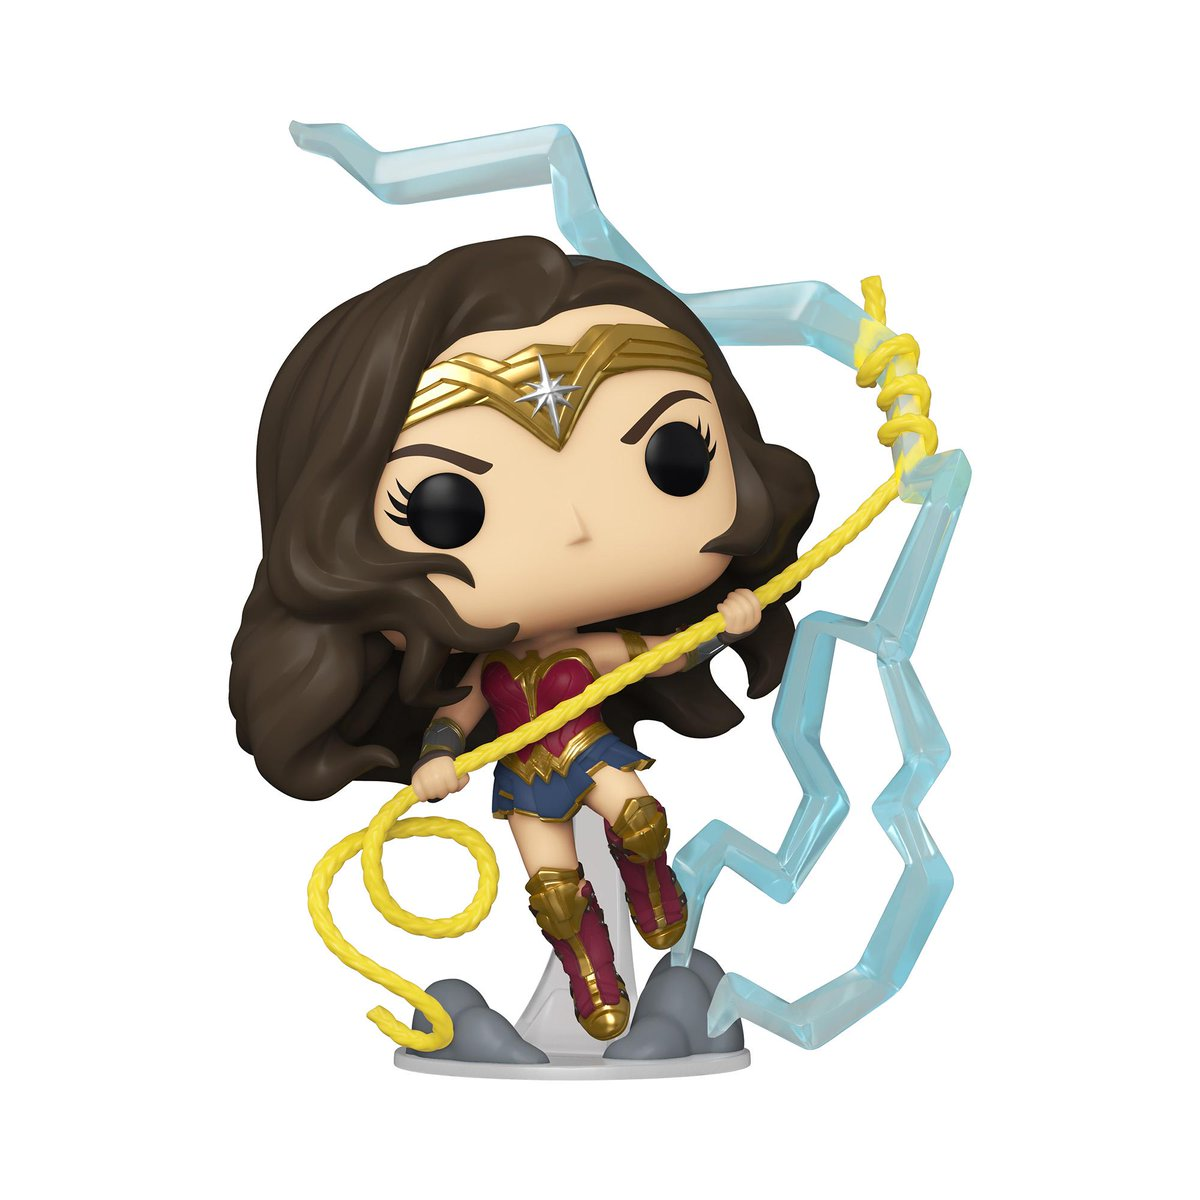 RT & follow @OriginalFunko for the chance to win this NYCC exclusive (Glow-in-the-Dark) Wonder Woman Pop! #Funkogiveaway #giveaway #WonderWoman #WW84 #WonderWoman1984